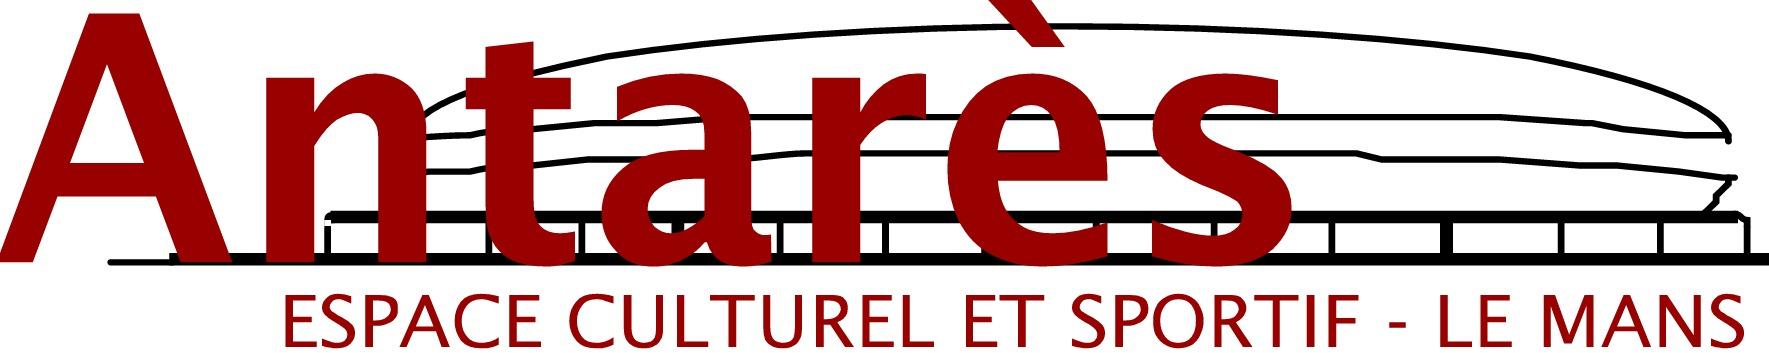 logo de ANTARES - espace culturel et sportif